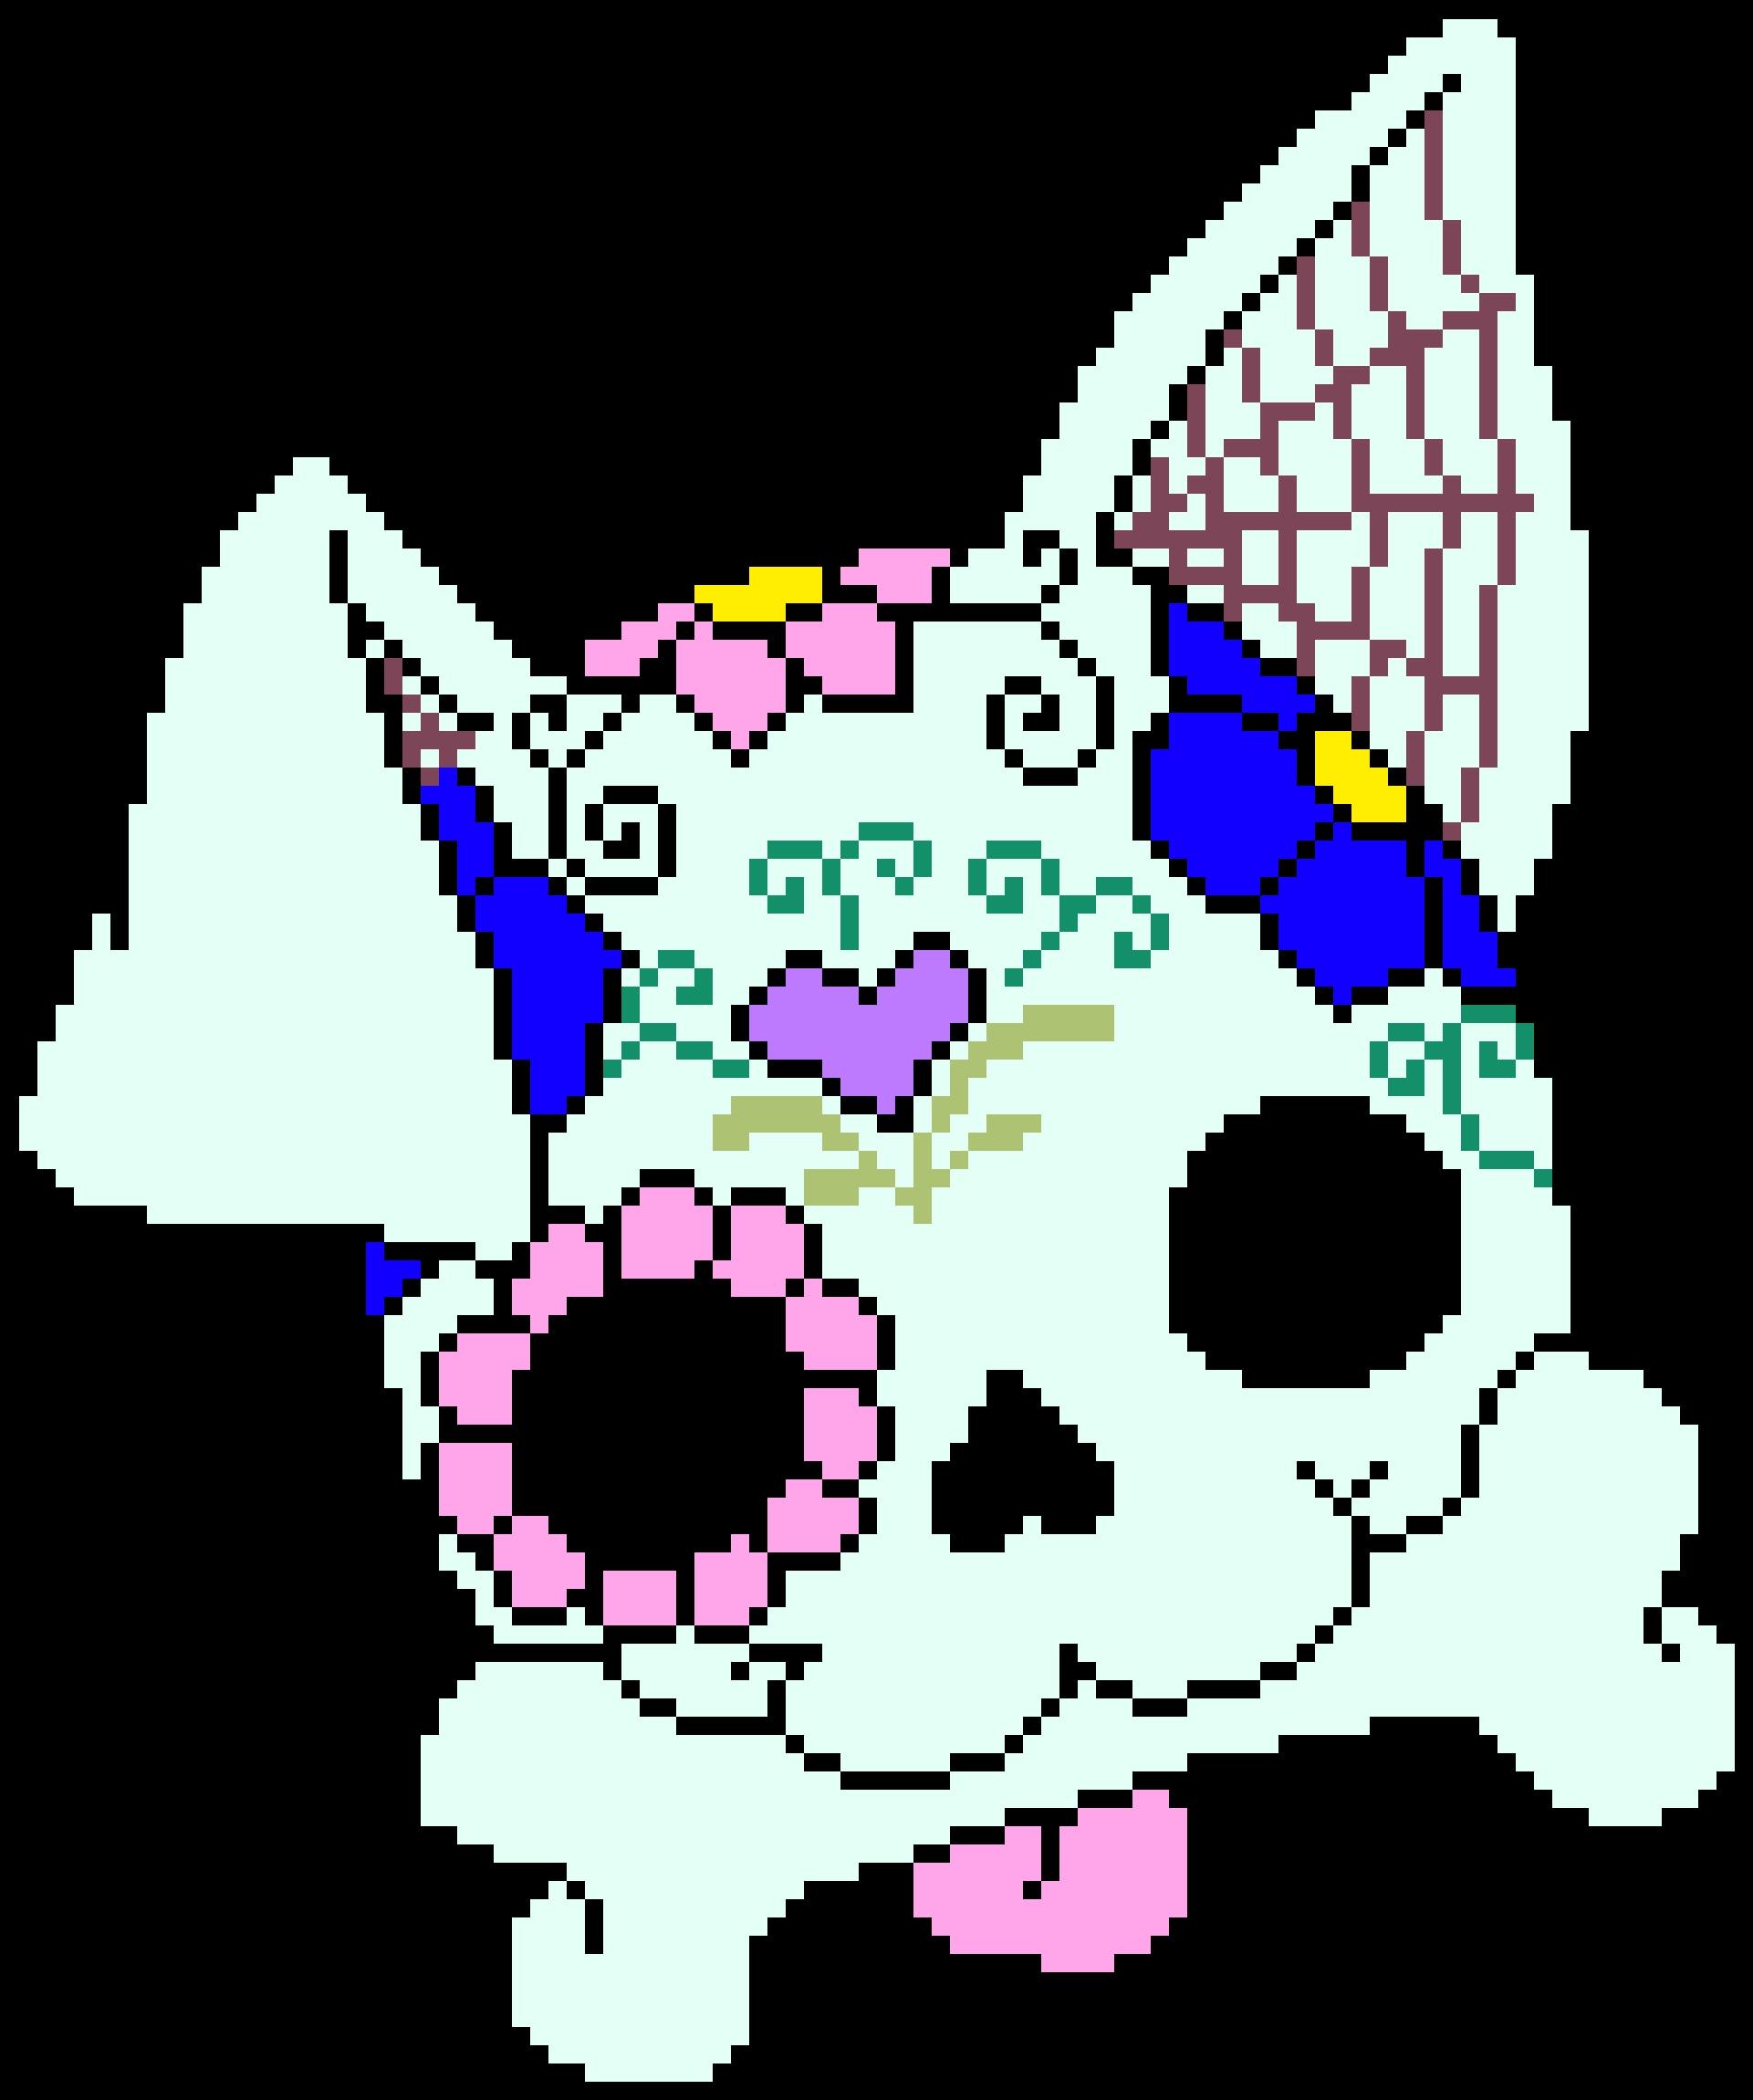 Transparent simple sugar skull clip art - Sugar Skull Dog - Sugar Skull Dog Cross Stitch Pattern